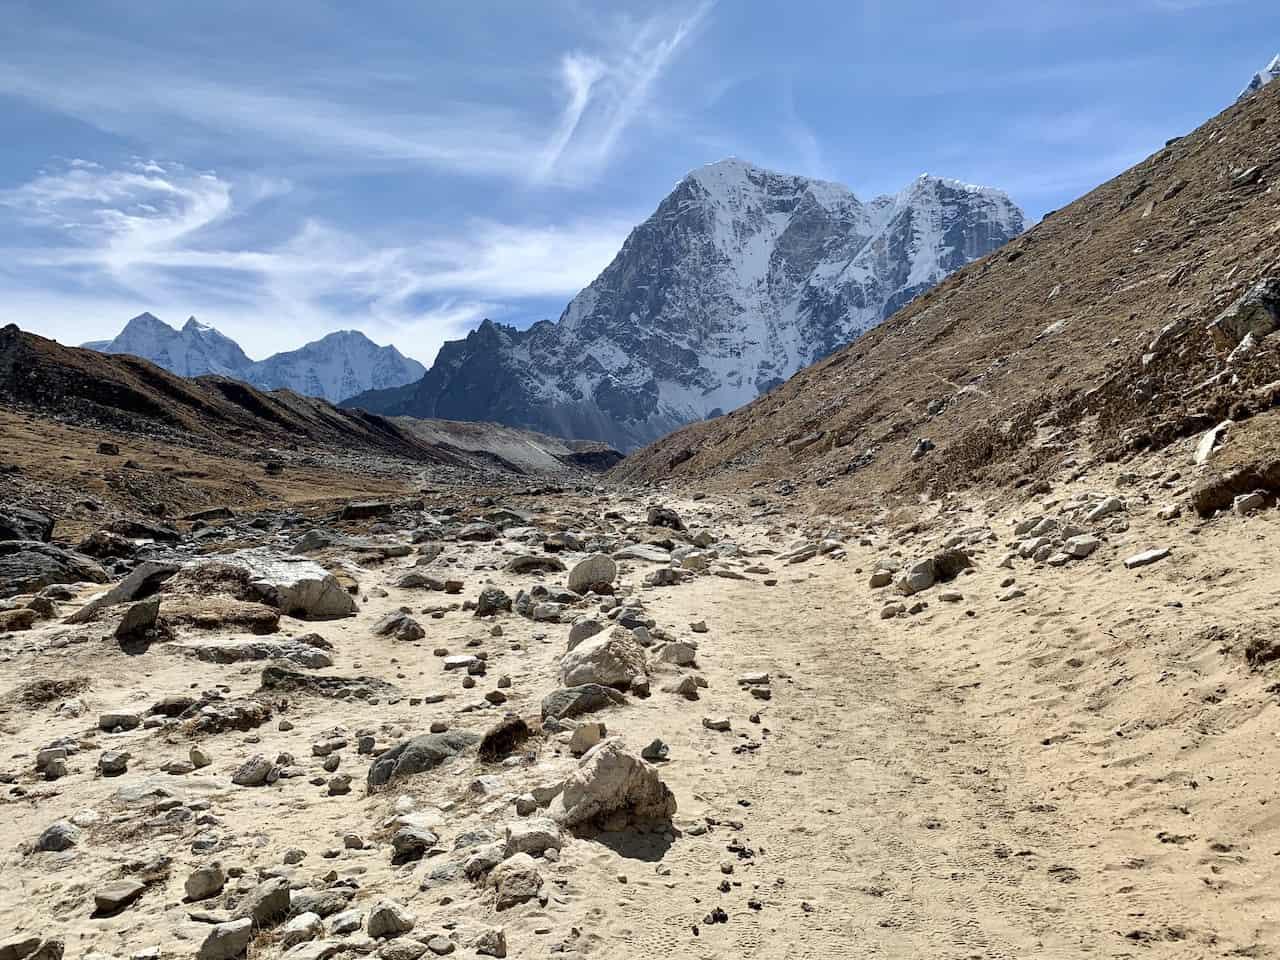 Dingboche to Lobuche Trekking